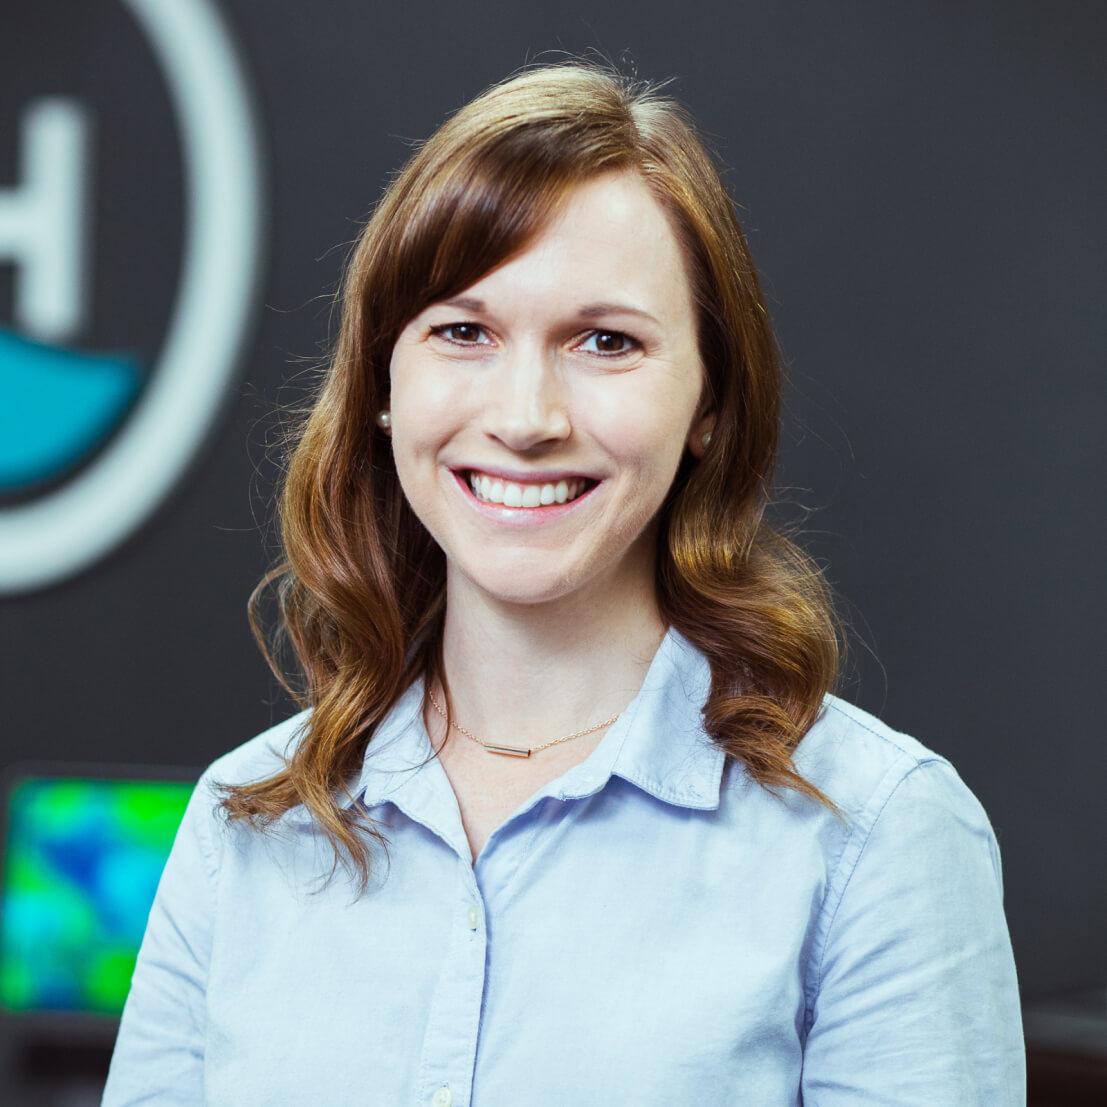 Amanda Hallett